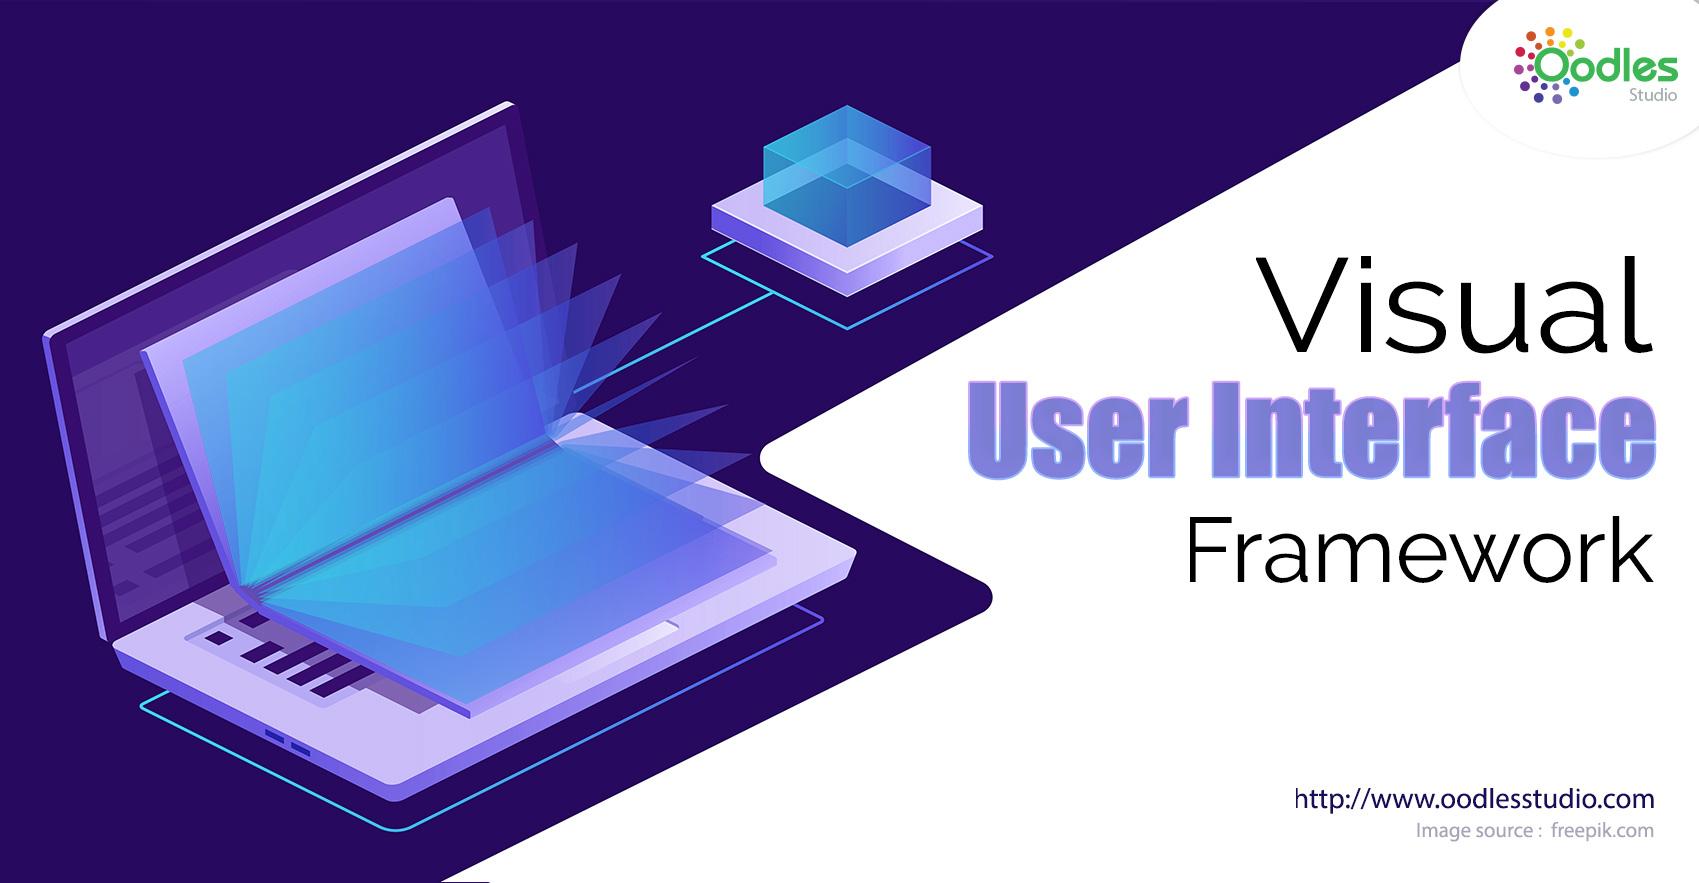 Visual-User-Interface-Framework-1